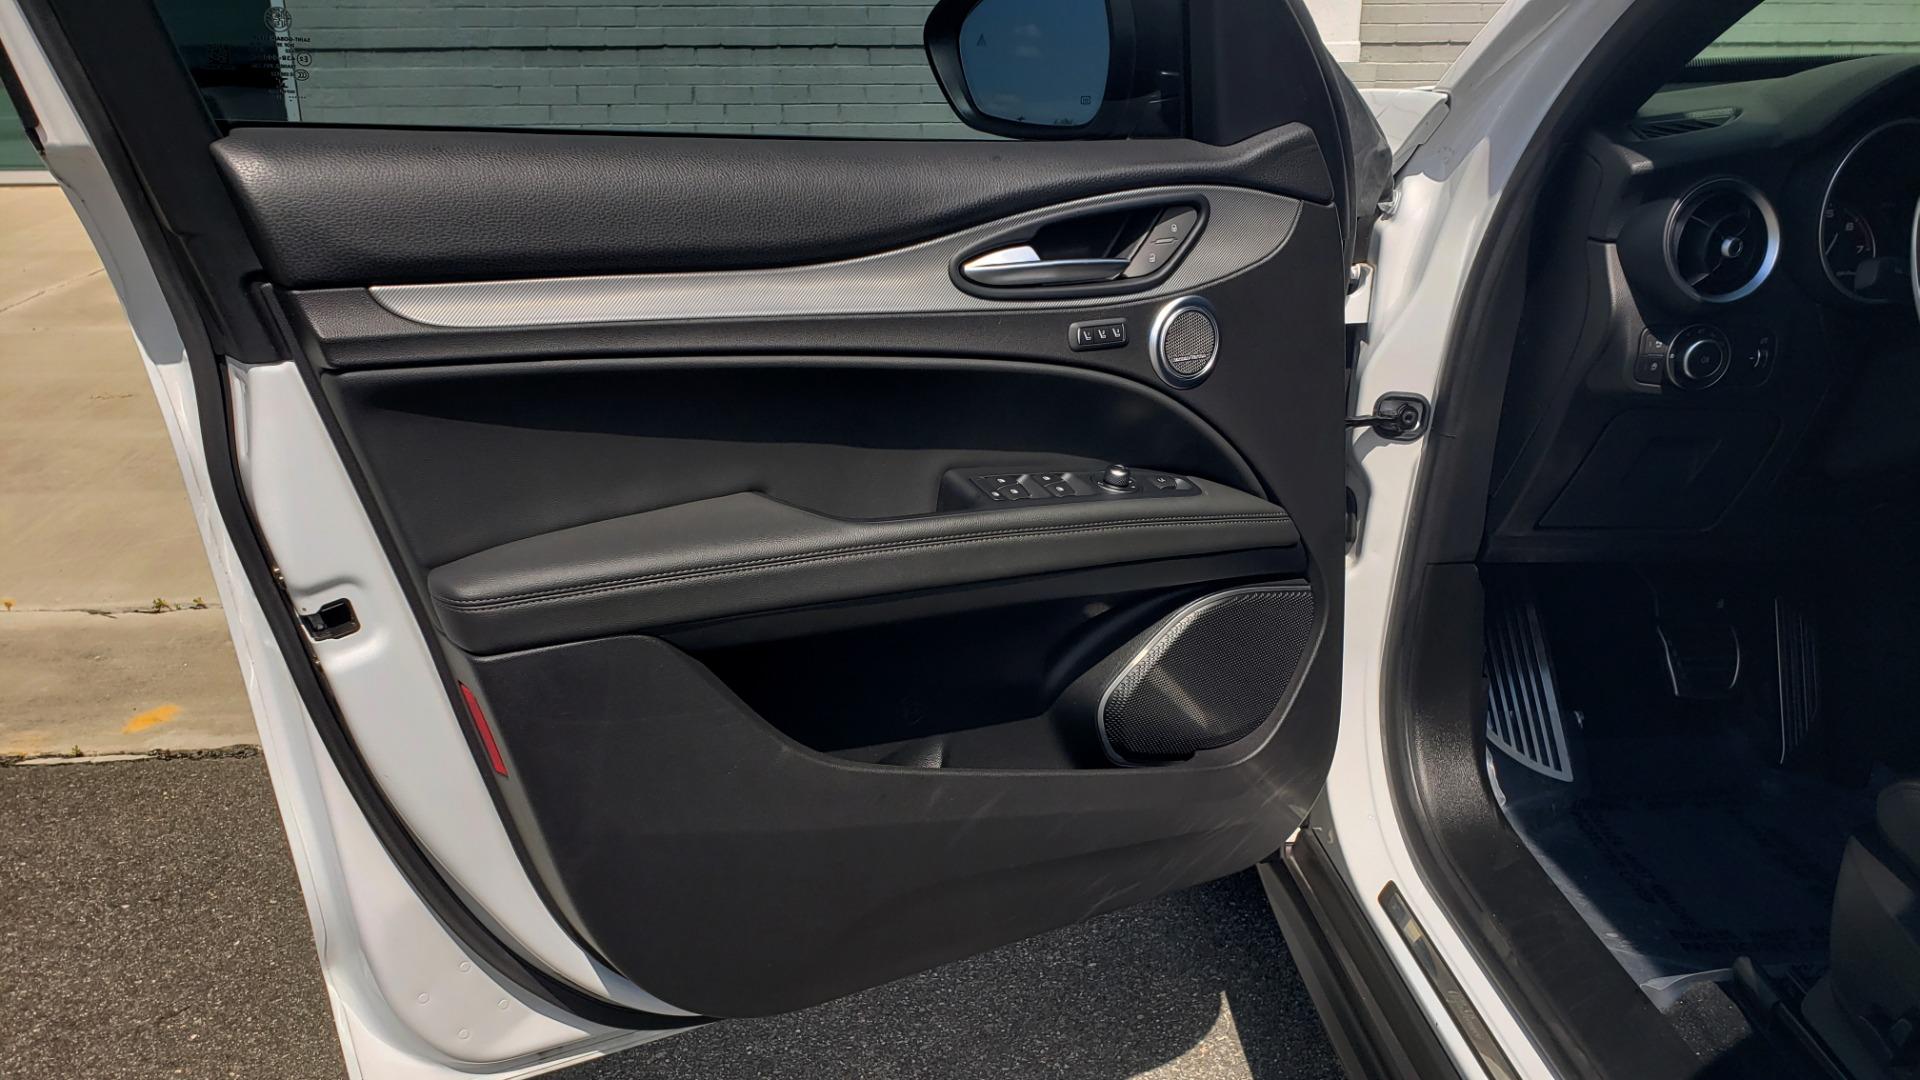 Used 2019 Alfa Romeo STELVIO TI SPORT AWD / 2.0L TURBO / 8-SPD AUTO / DRVR ASST / REARVIEW for sale $37,495 at Formula Imports in Charlotte NC 28227 37